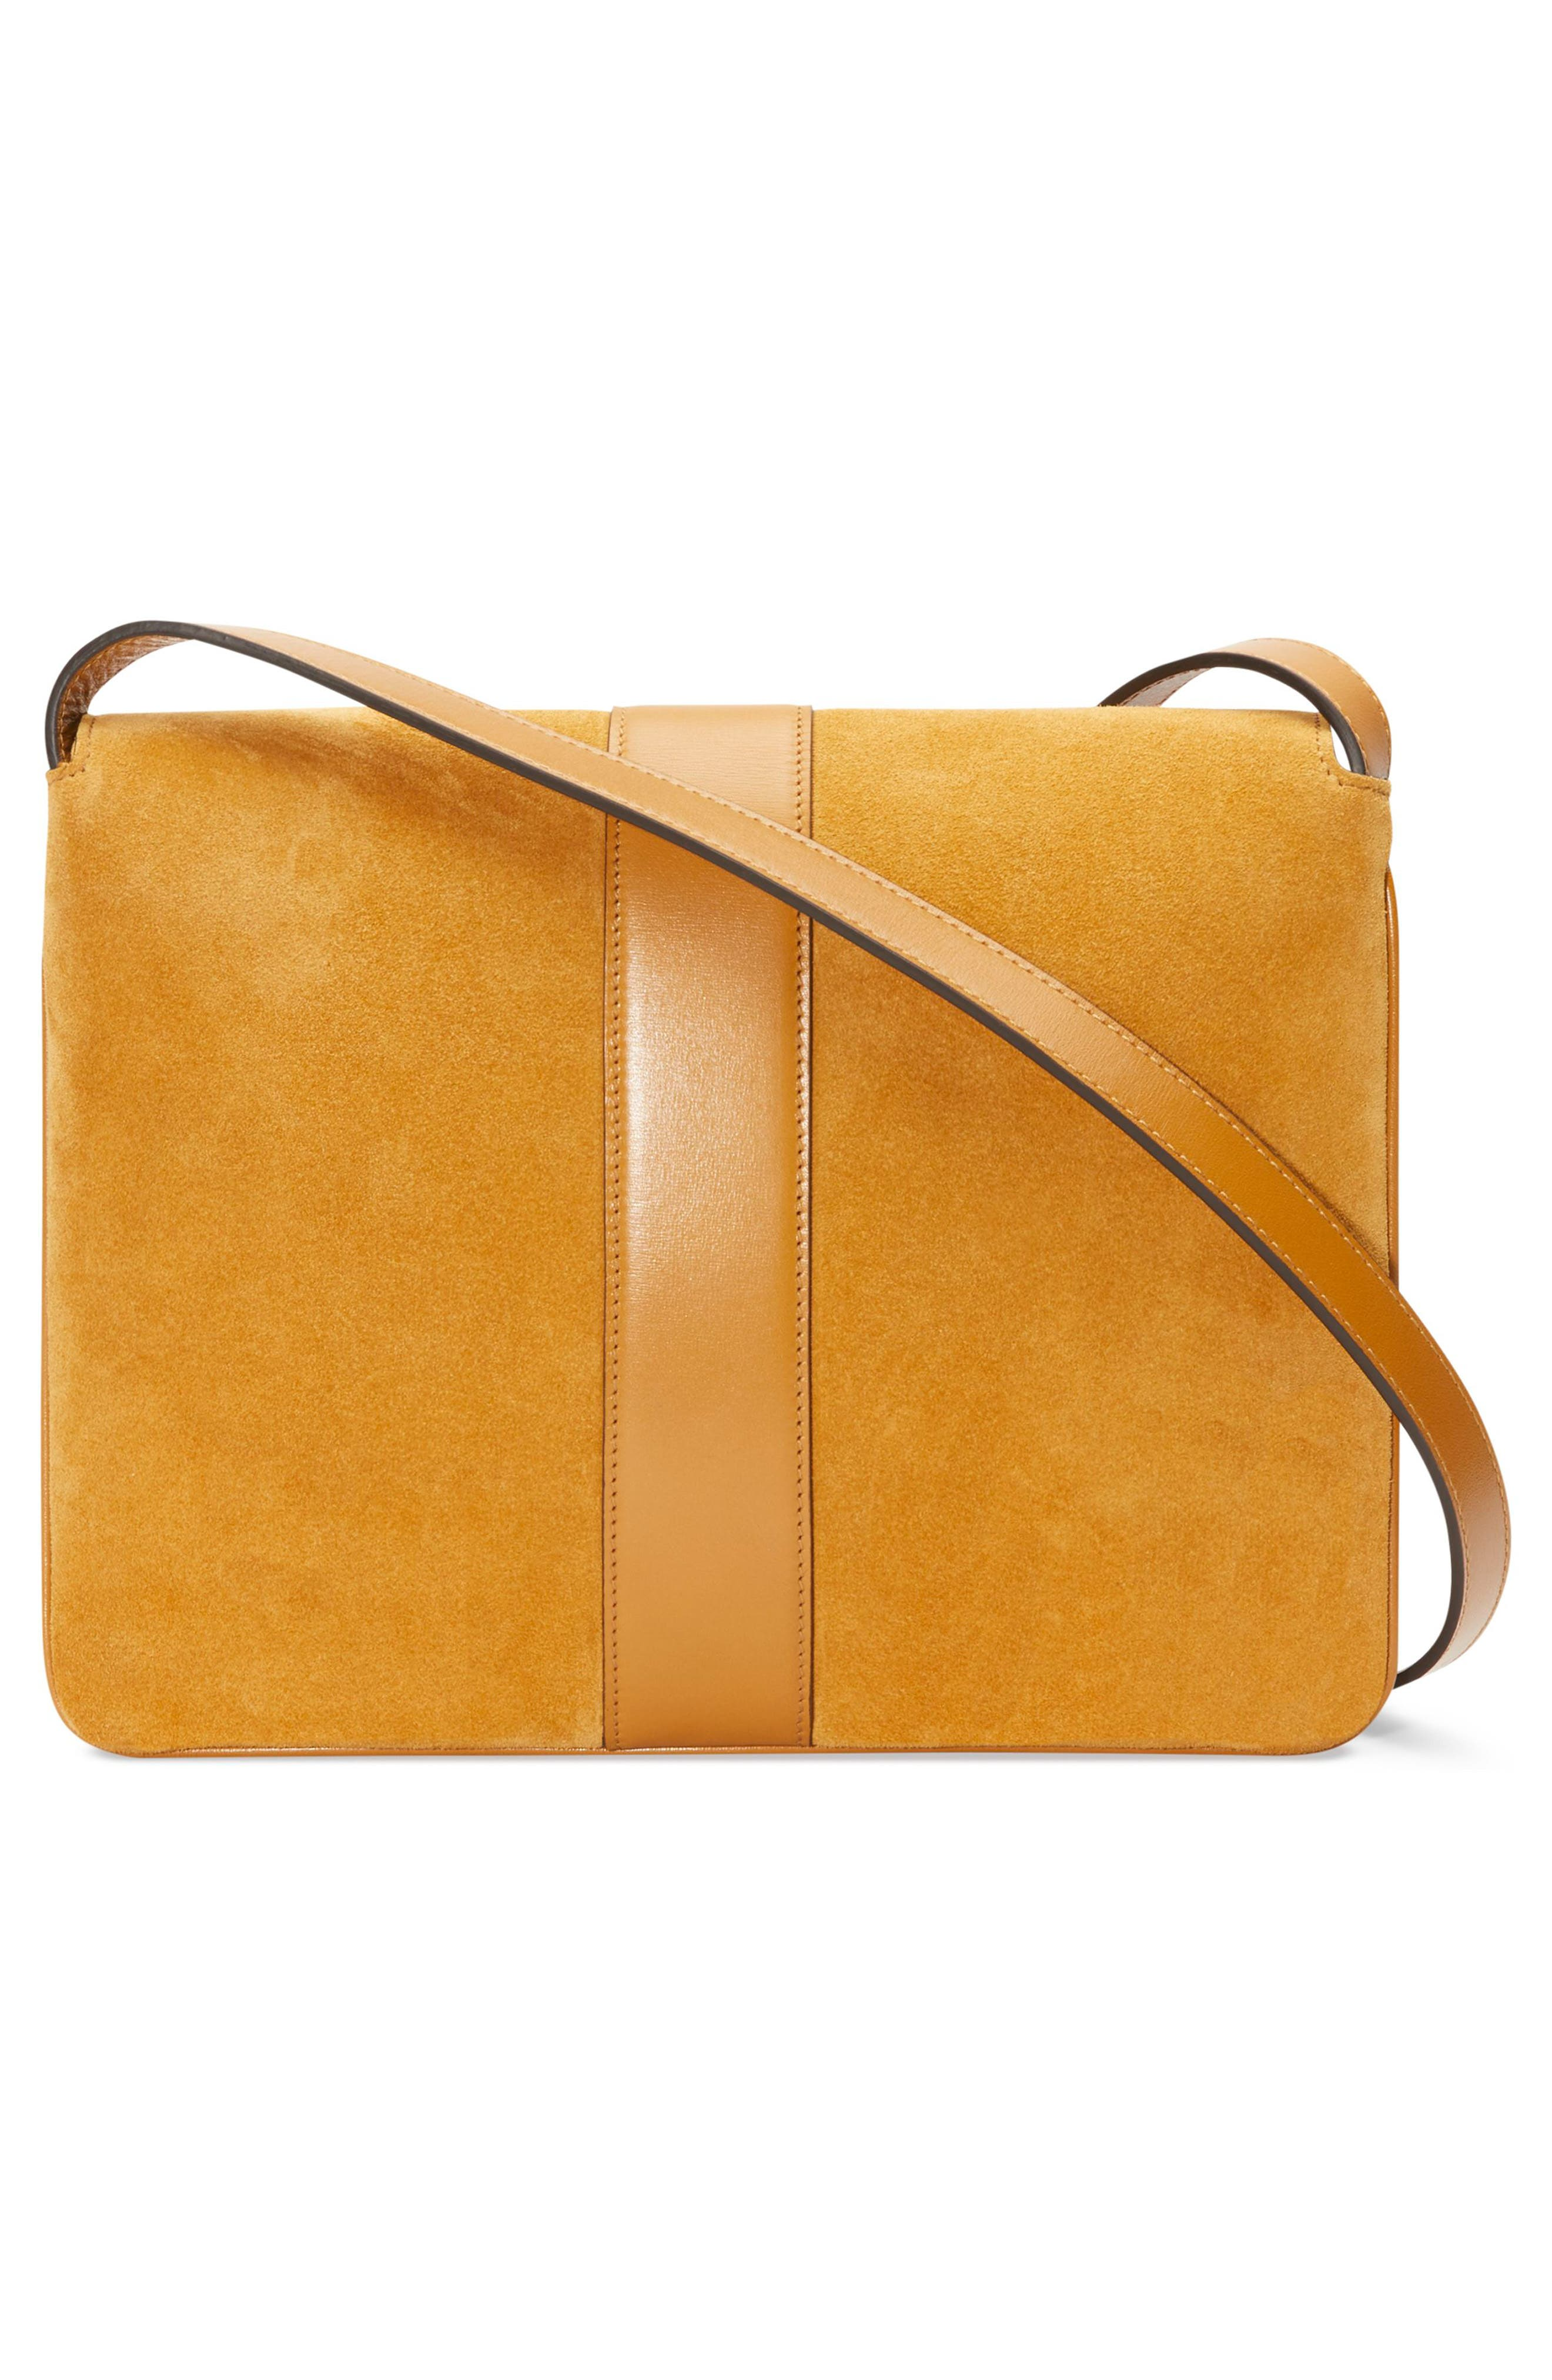 Medium Arli Shoulder Bag,                             Alternate thumbnail 2, color,                             LIGHT COGNAC